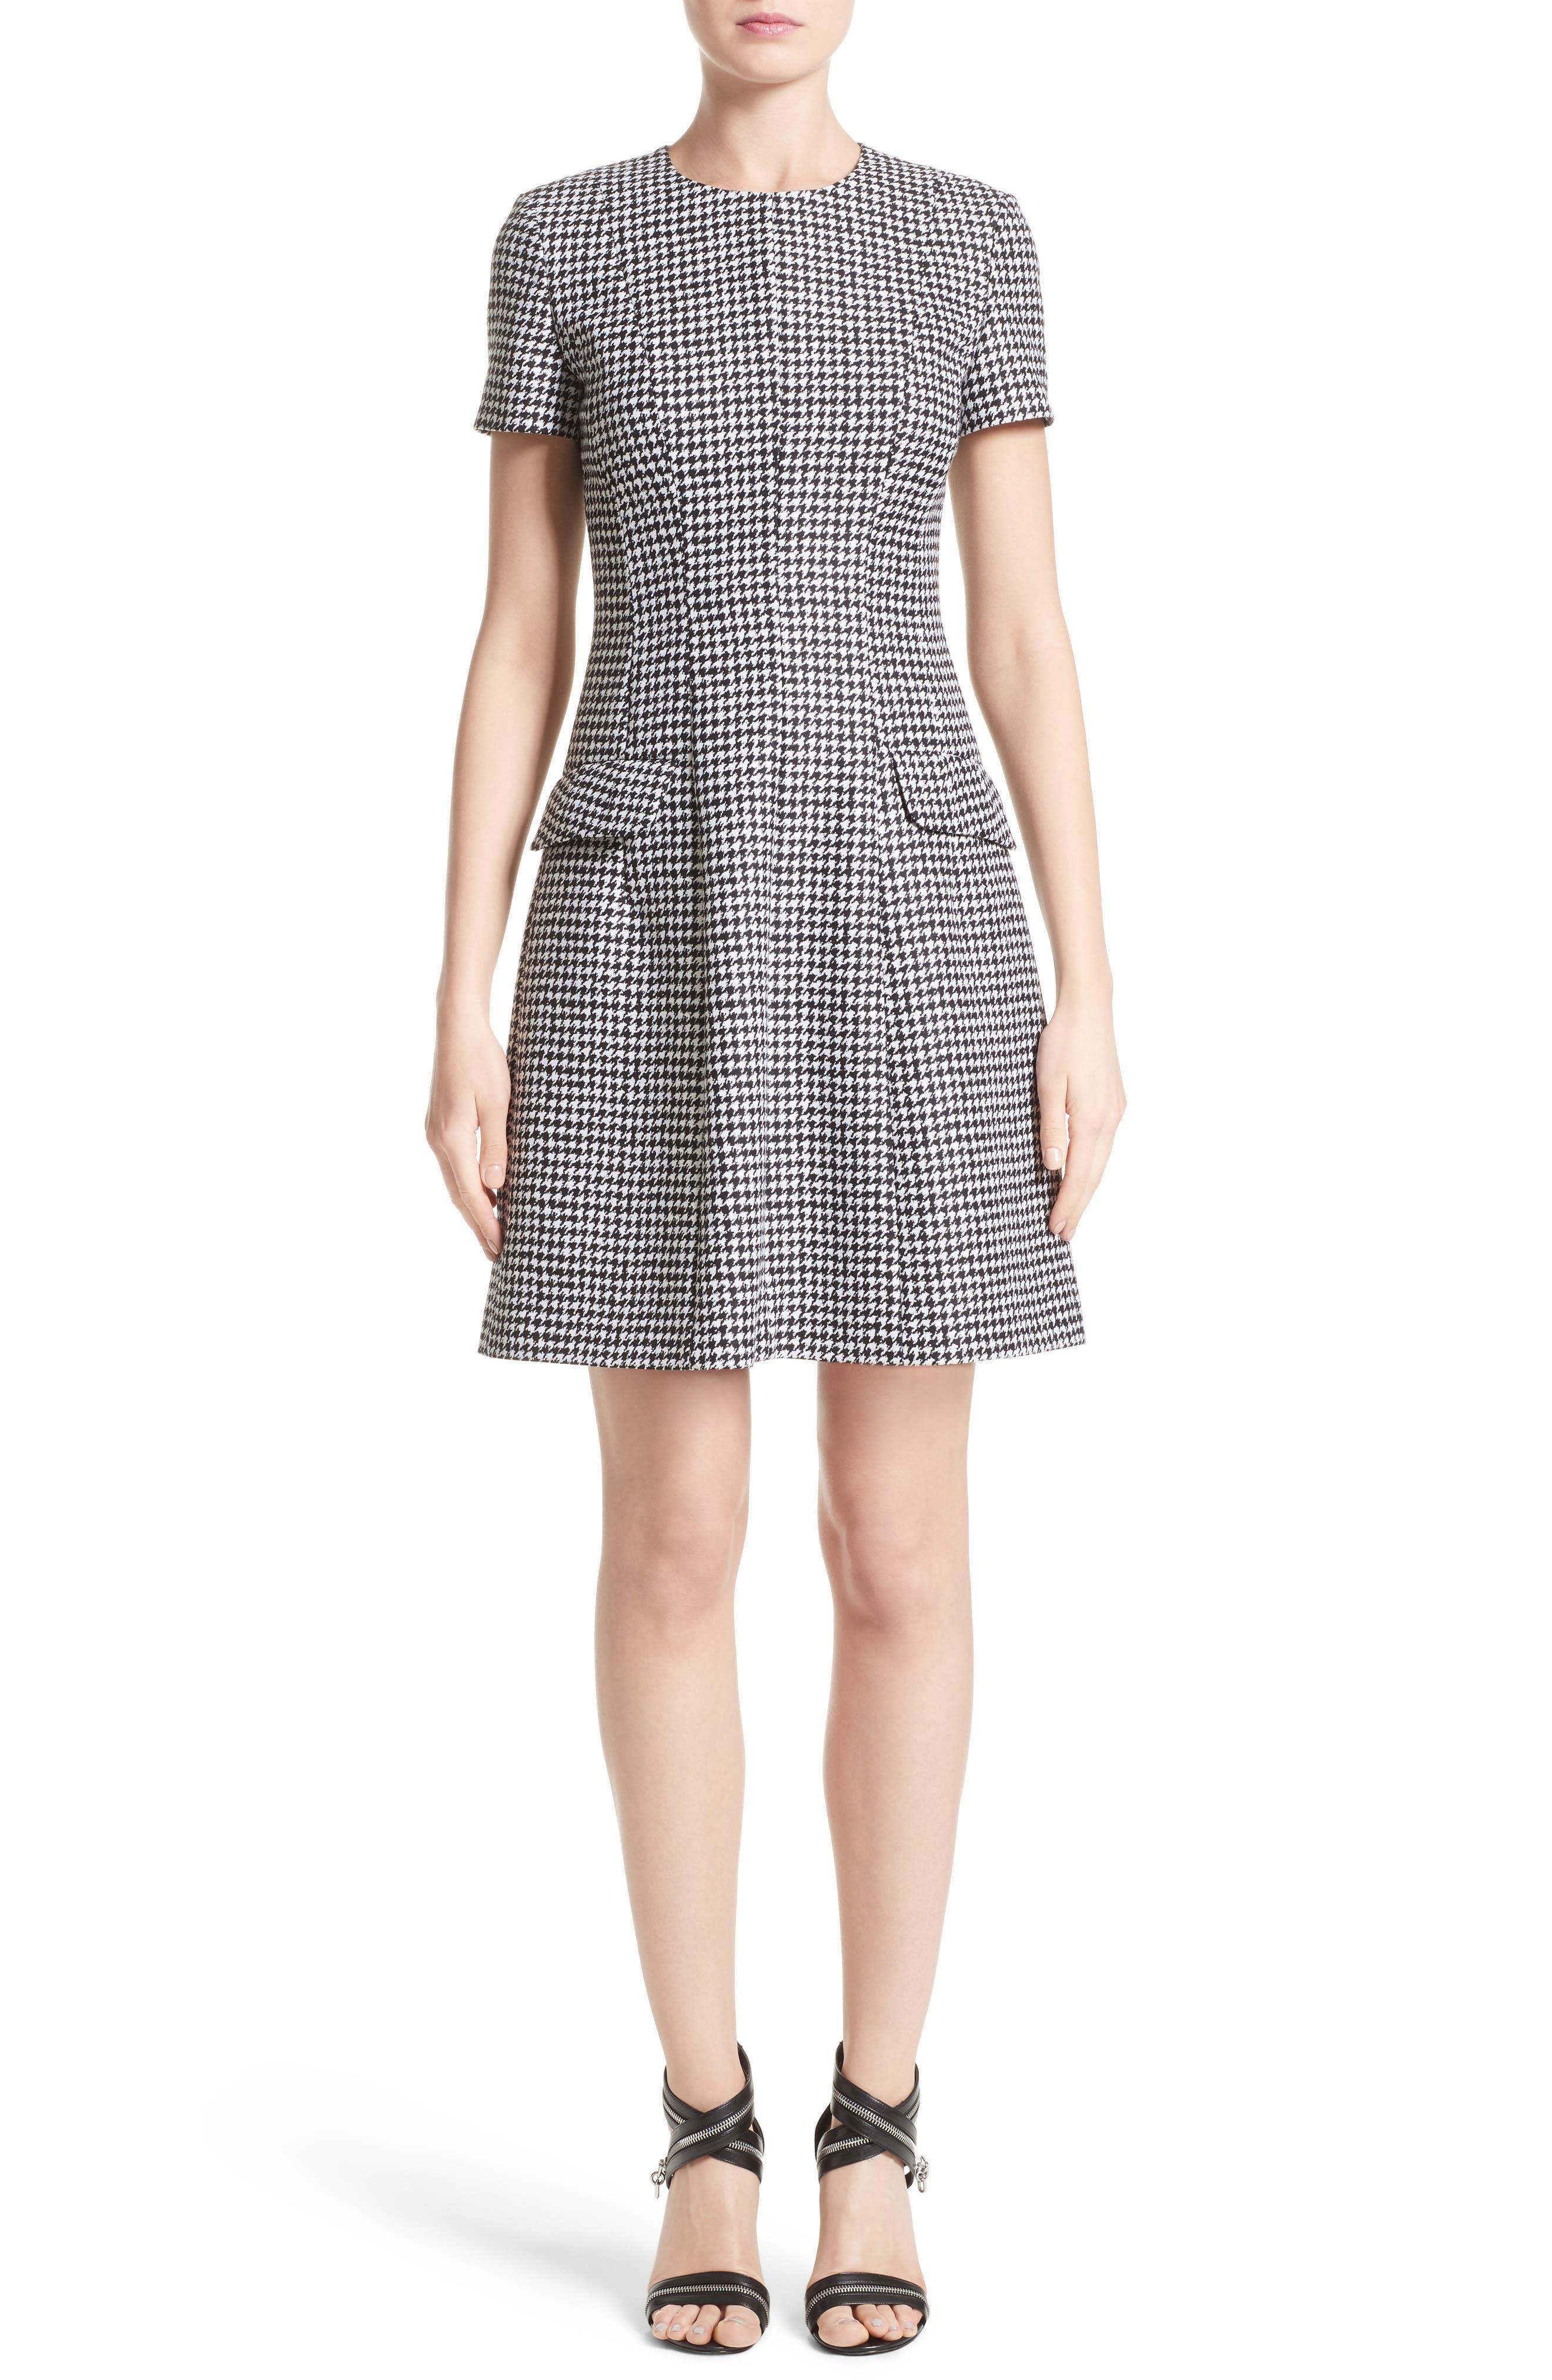 Michael Kors Houndstooth Wool Jacquard A-Line Dress